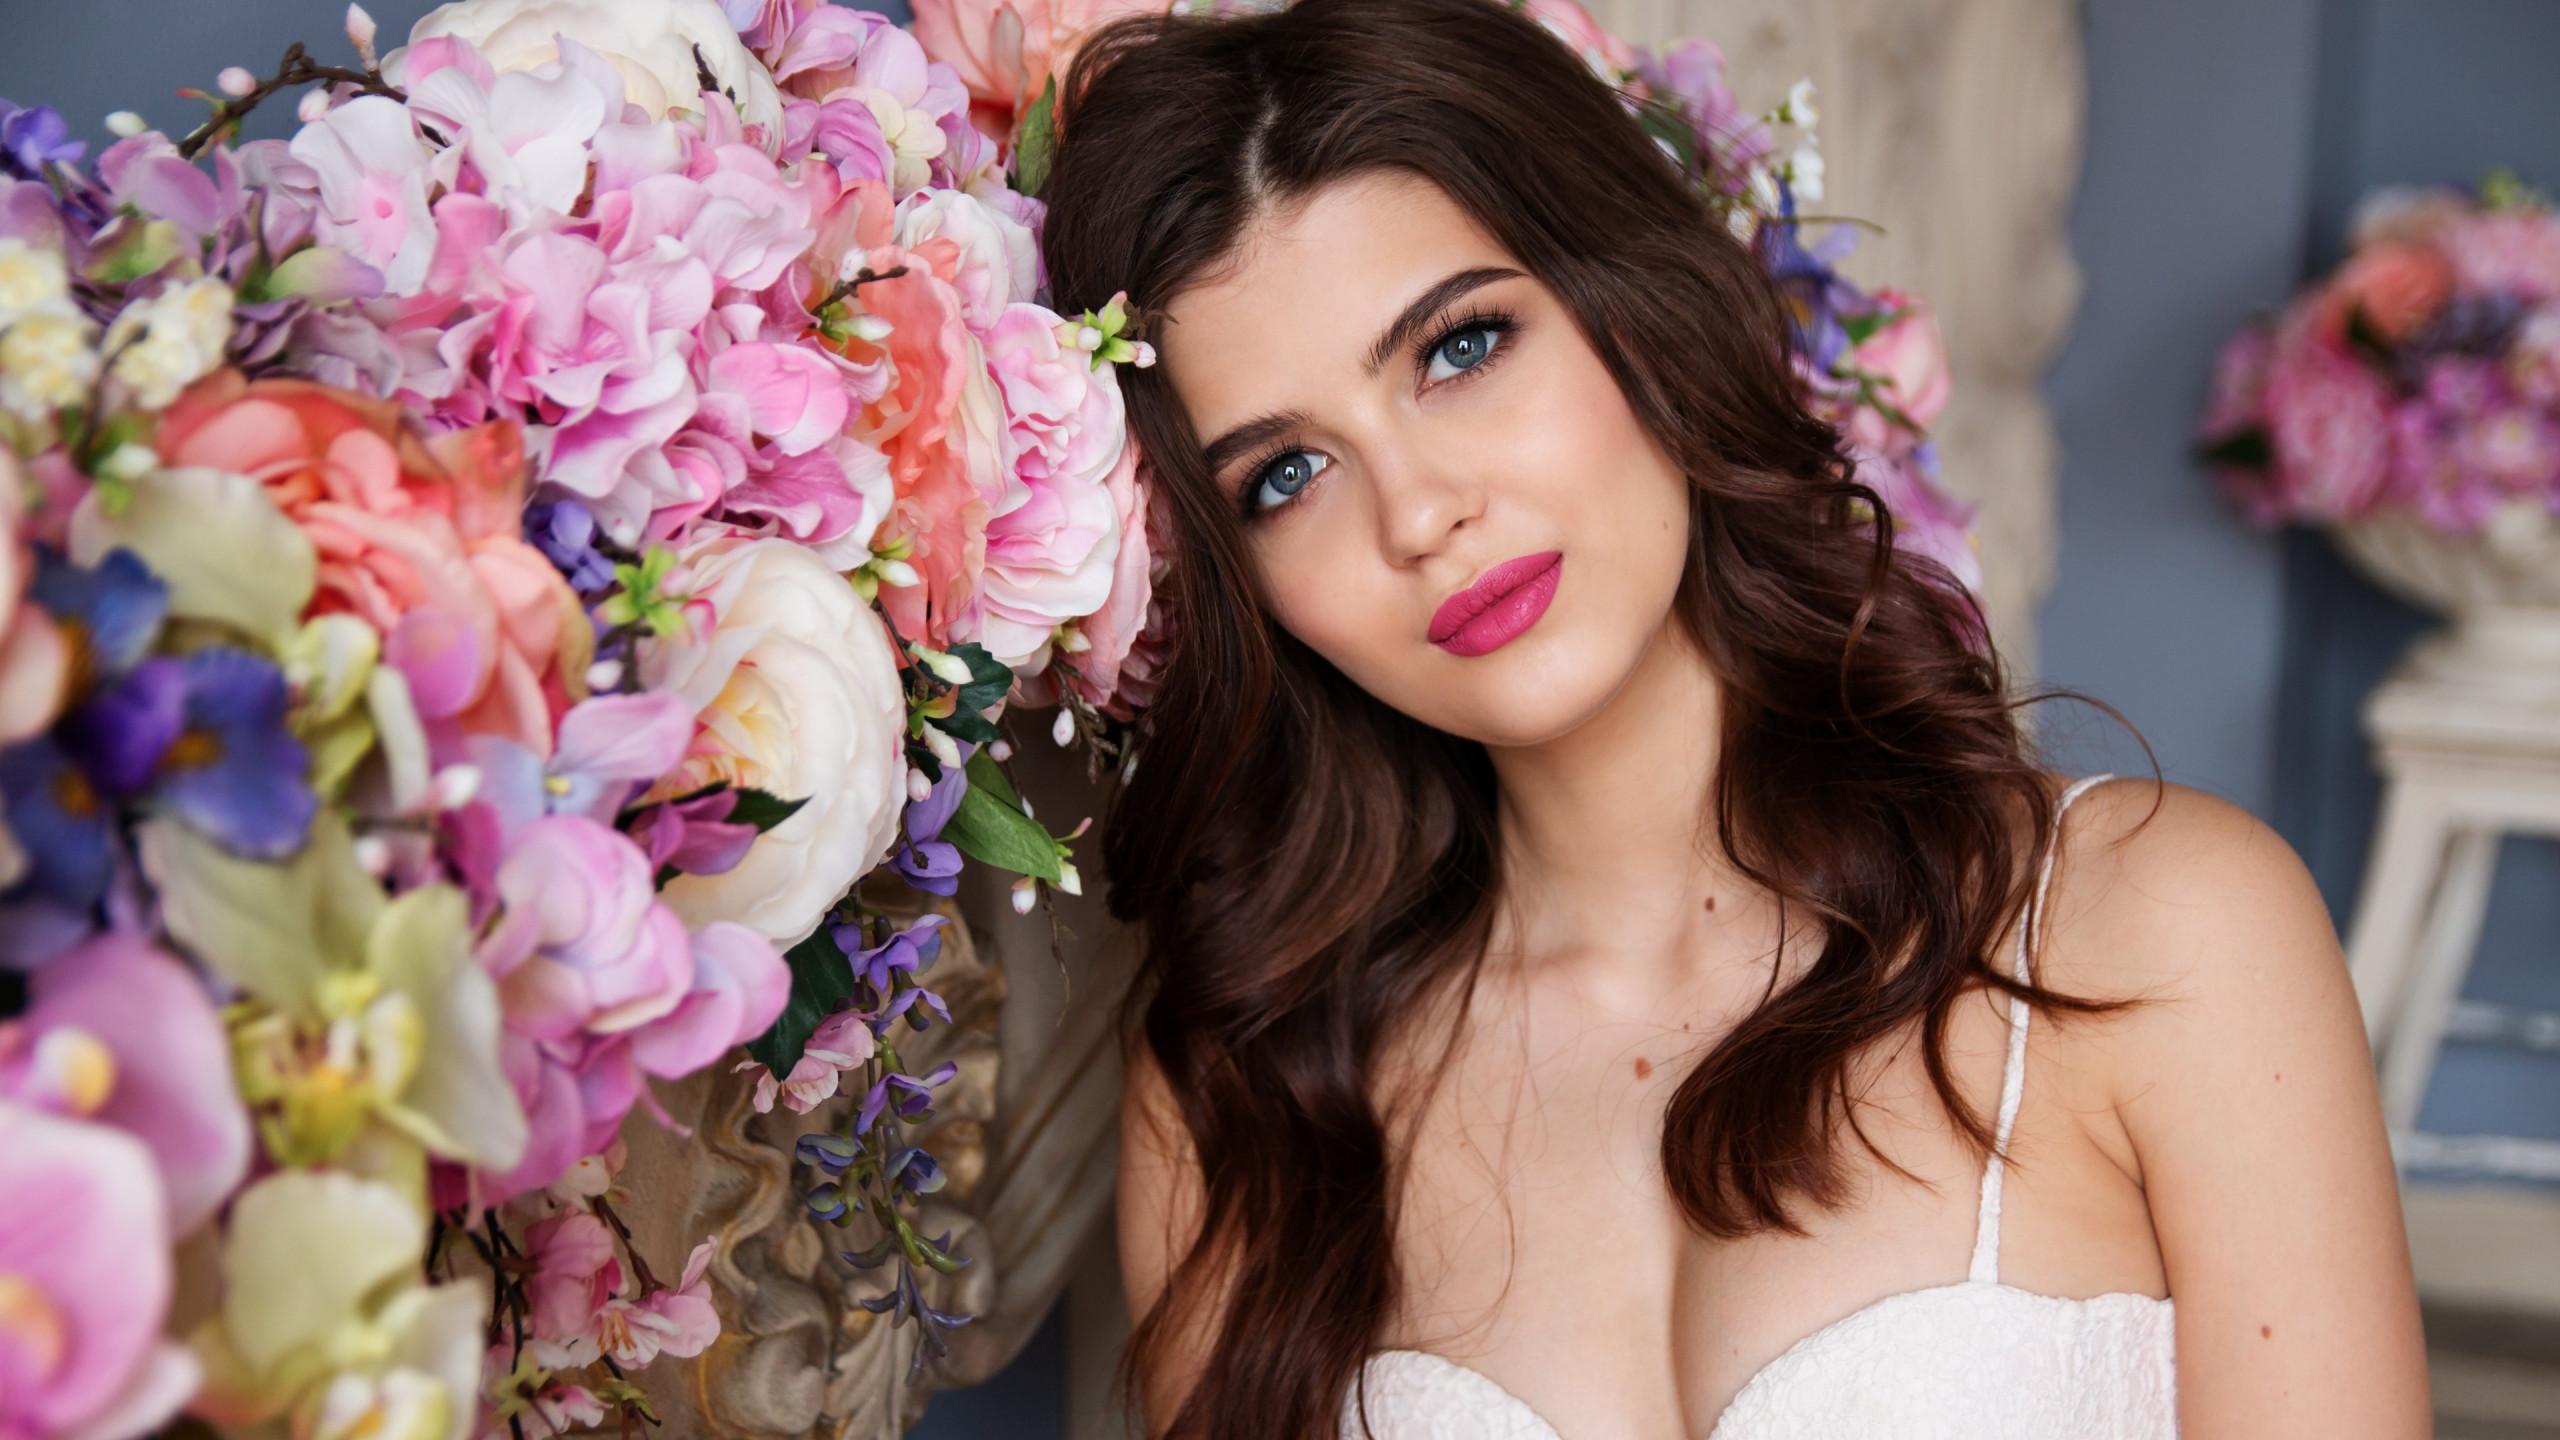 Download Wallpaper Beautiful Girl Portrait 2560x1440